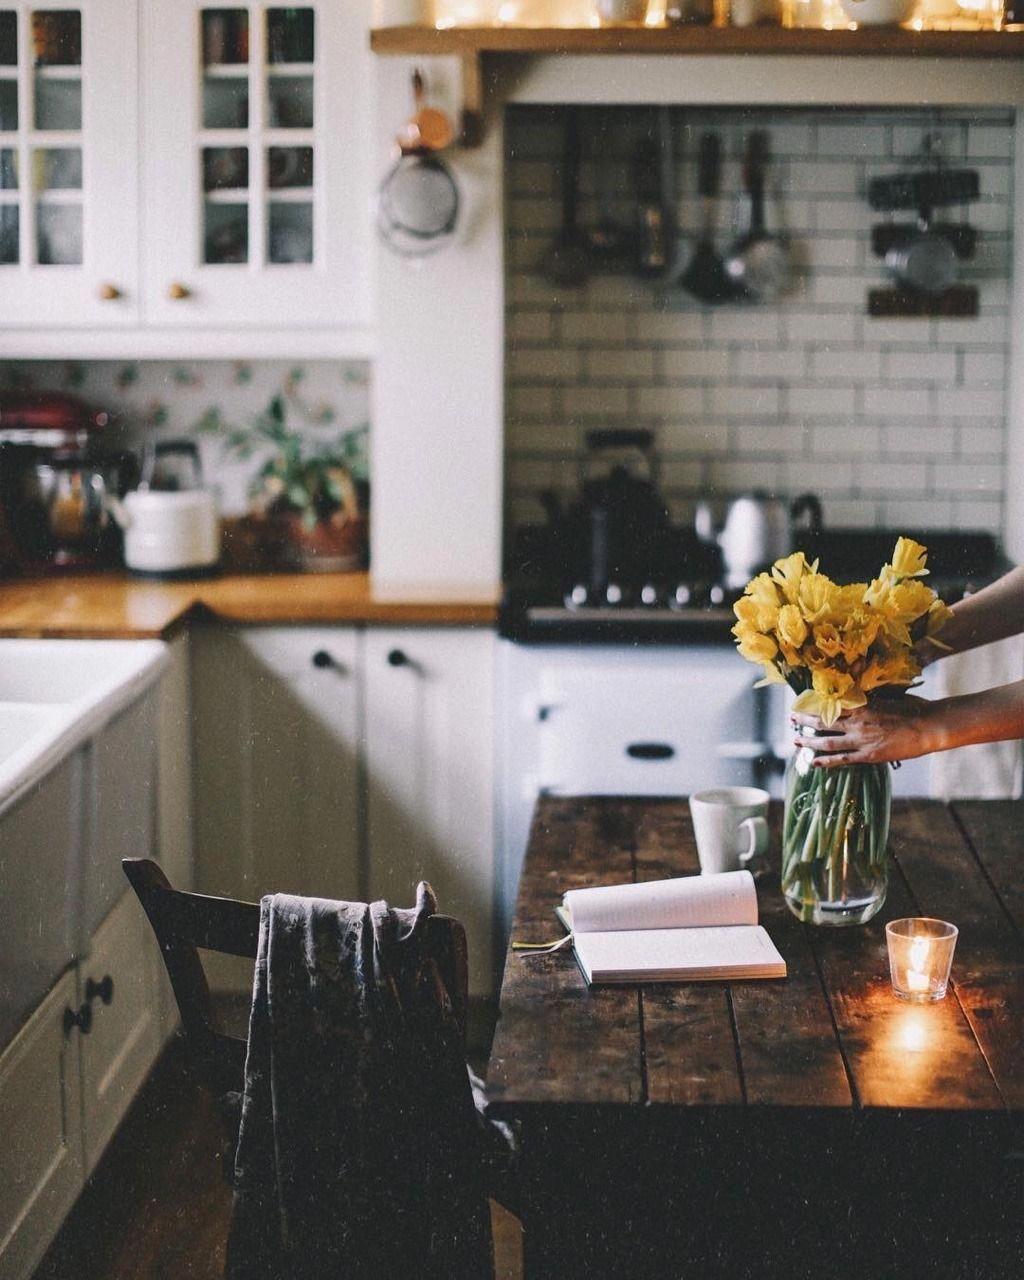 kitchen remodel costs calculator